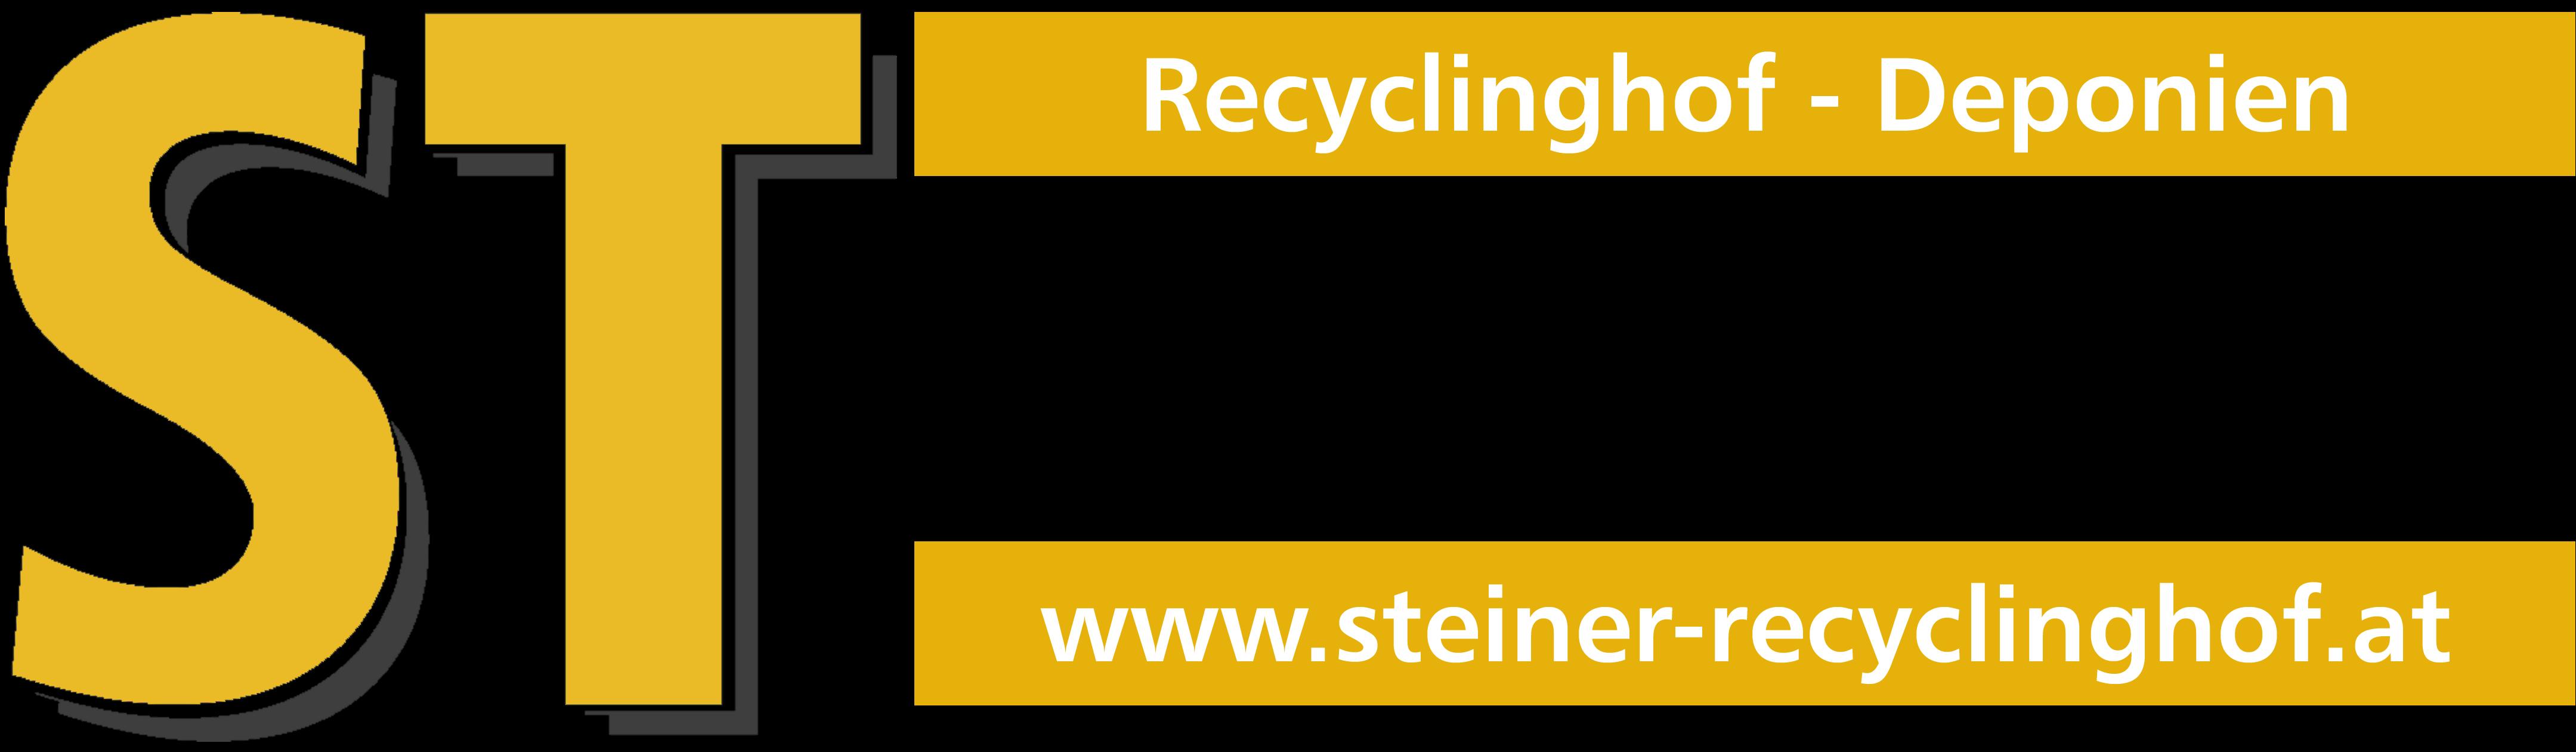 STEINER GmbH Recyclinghof – Deponien